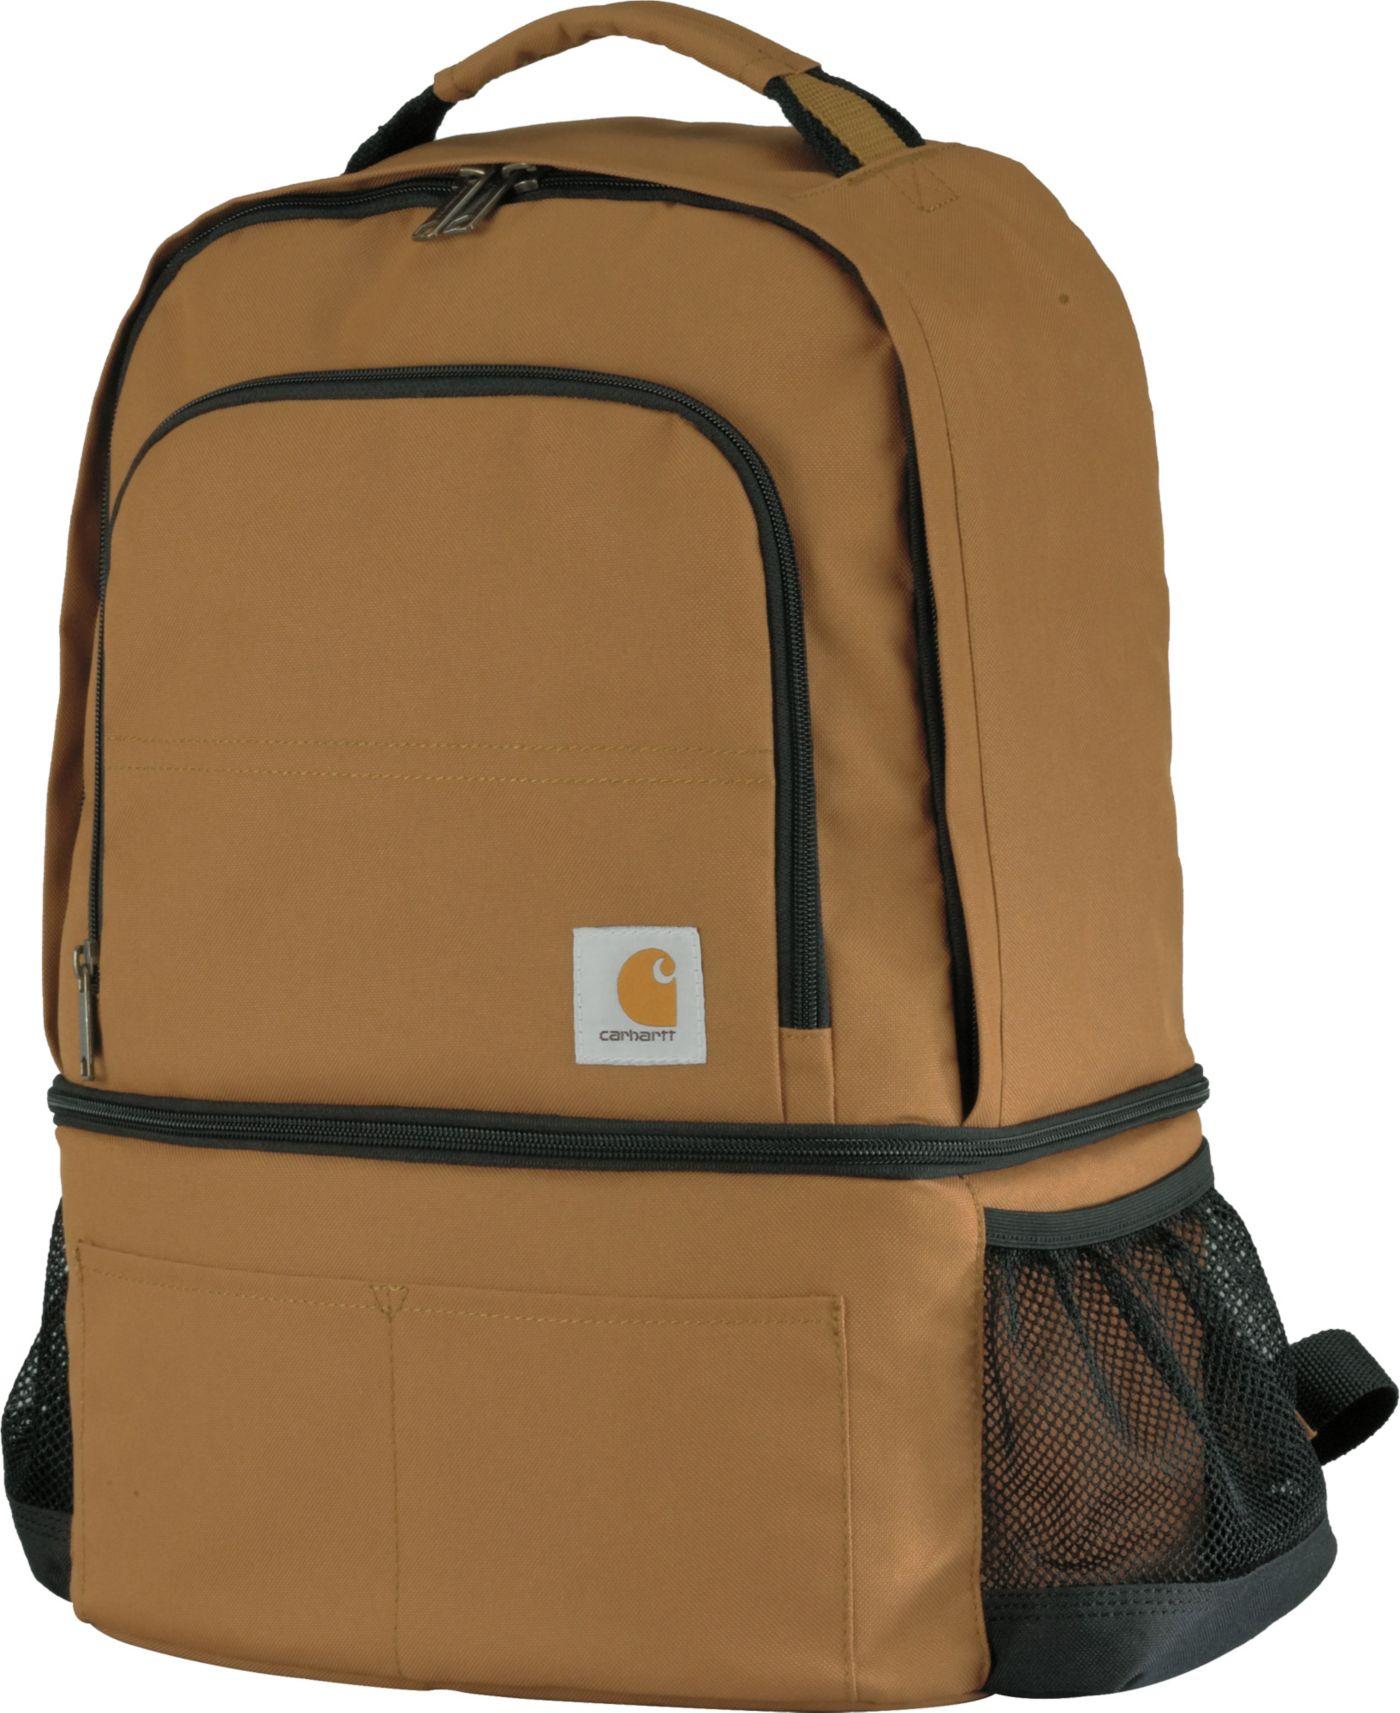 Carhartt Cooler Backpack